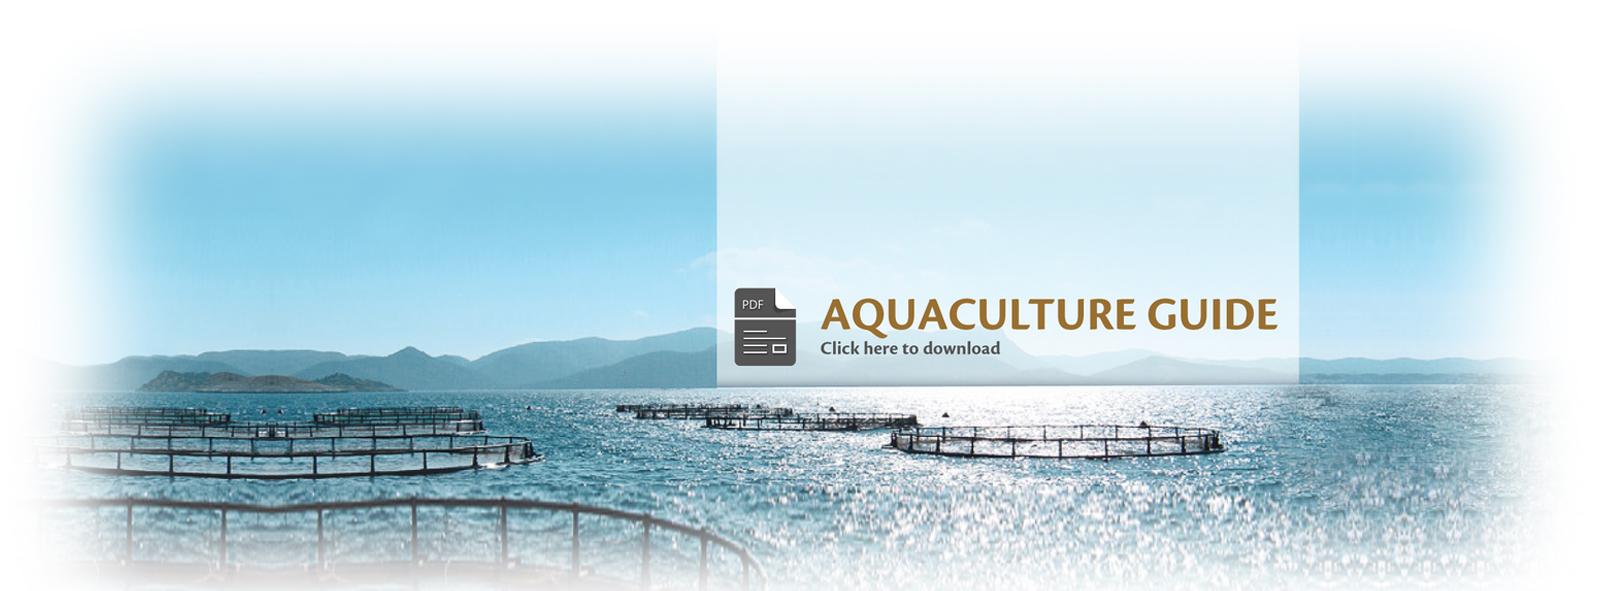 aquaculture guide